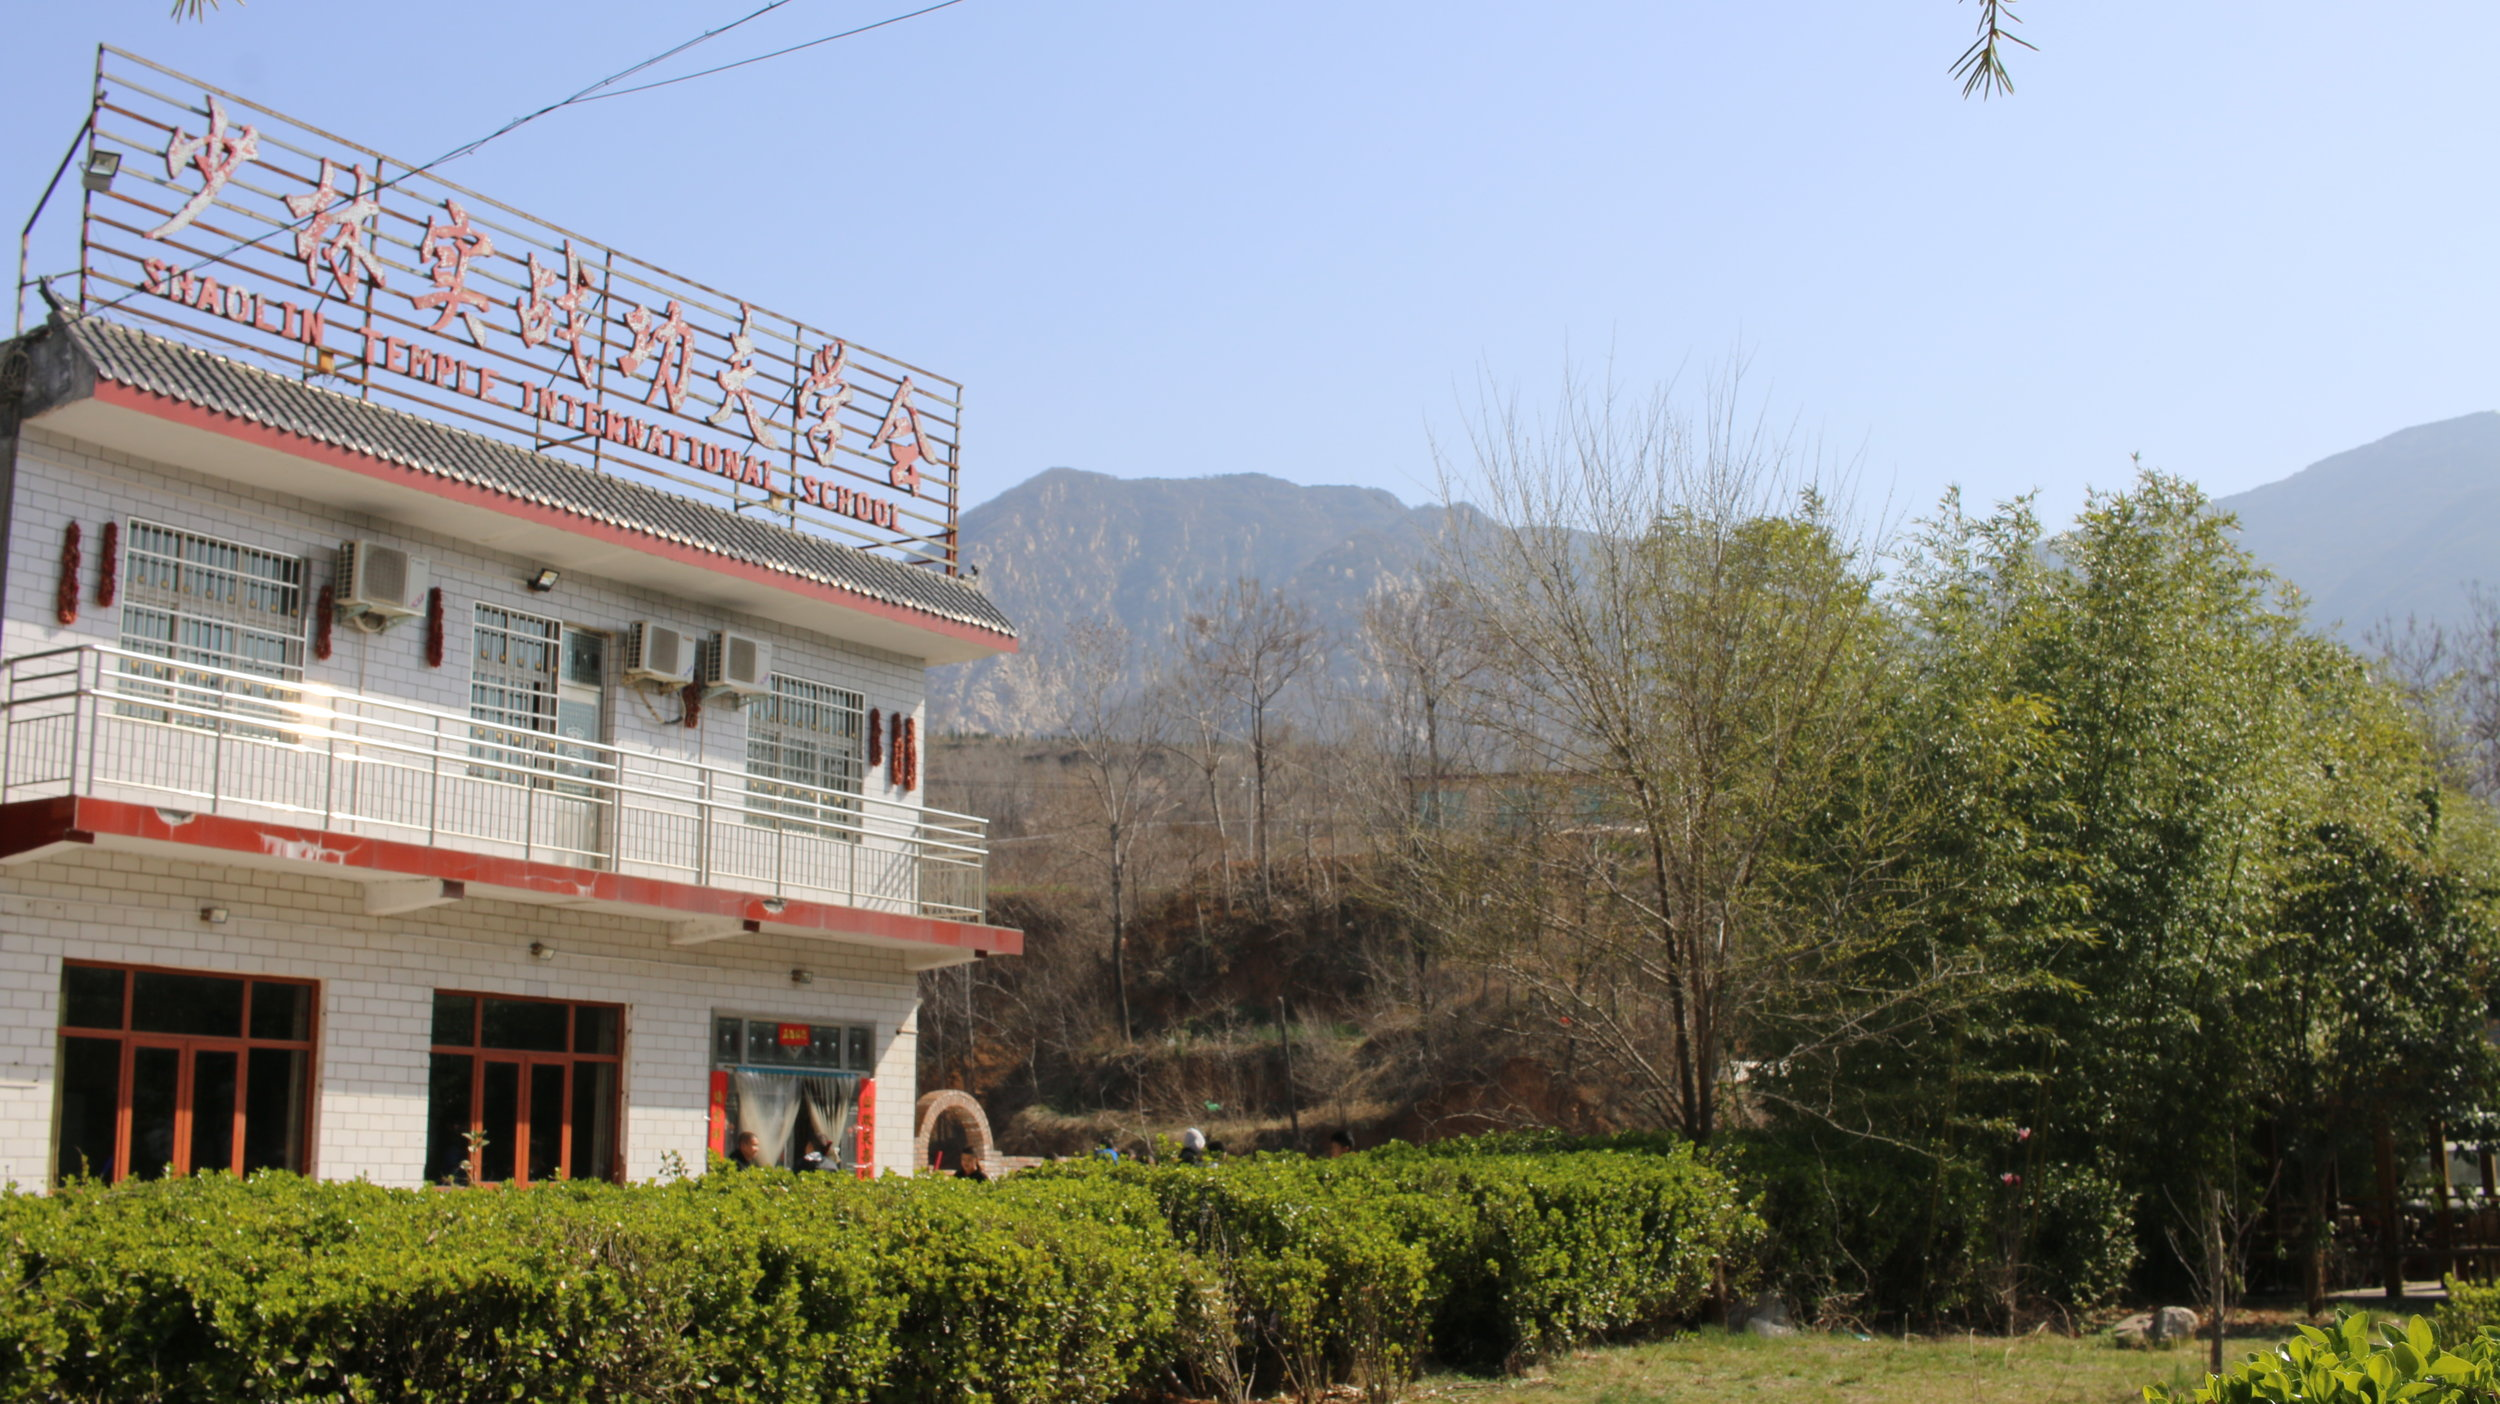 Shaolin temple school china.JPG